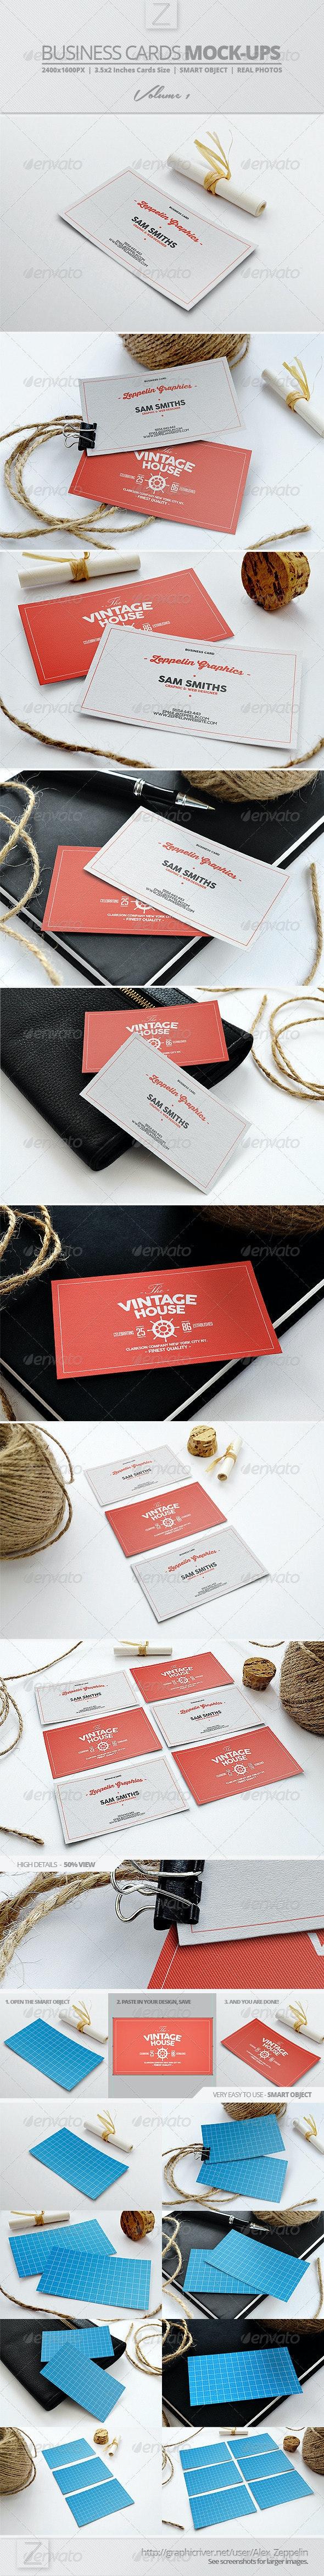 Business Card Mock-ups Vol.1 - Business Cards Print